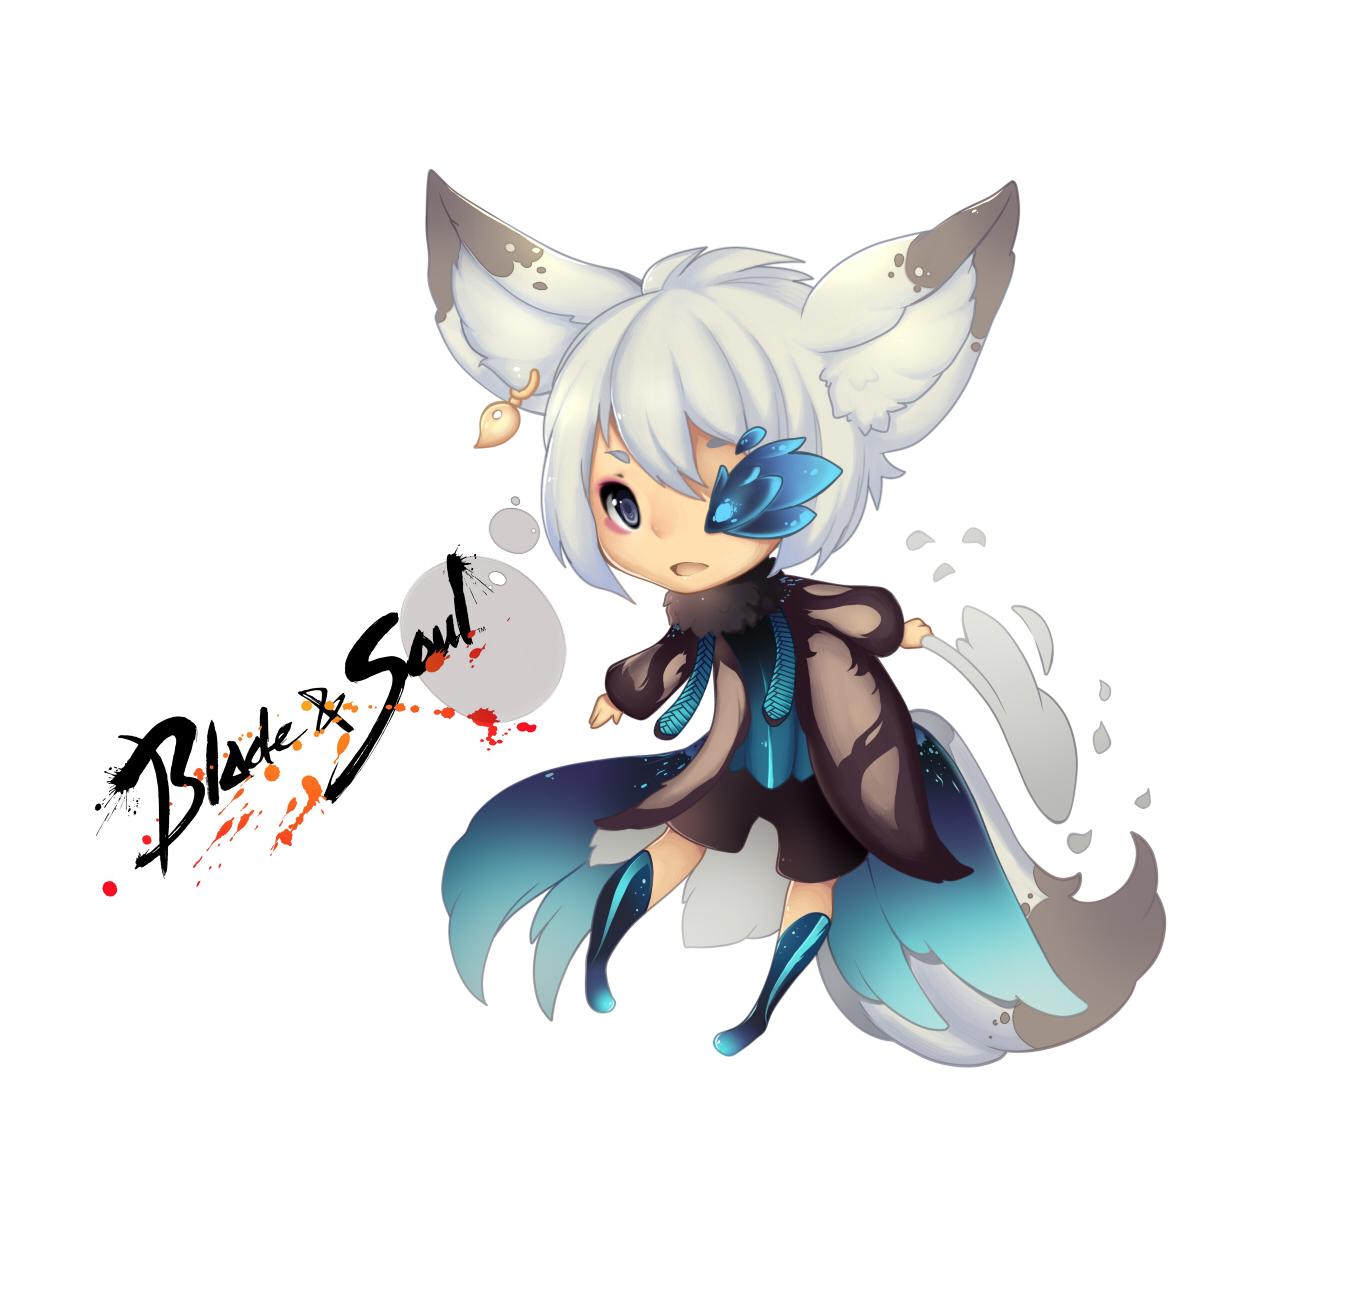 Blade N Soul Anime Characters : Blade n soul s u m o e r by flurkitty on deviantart